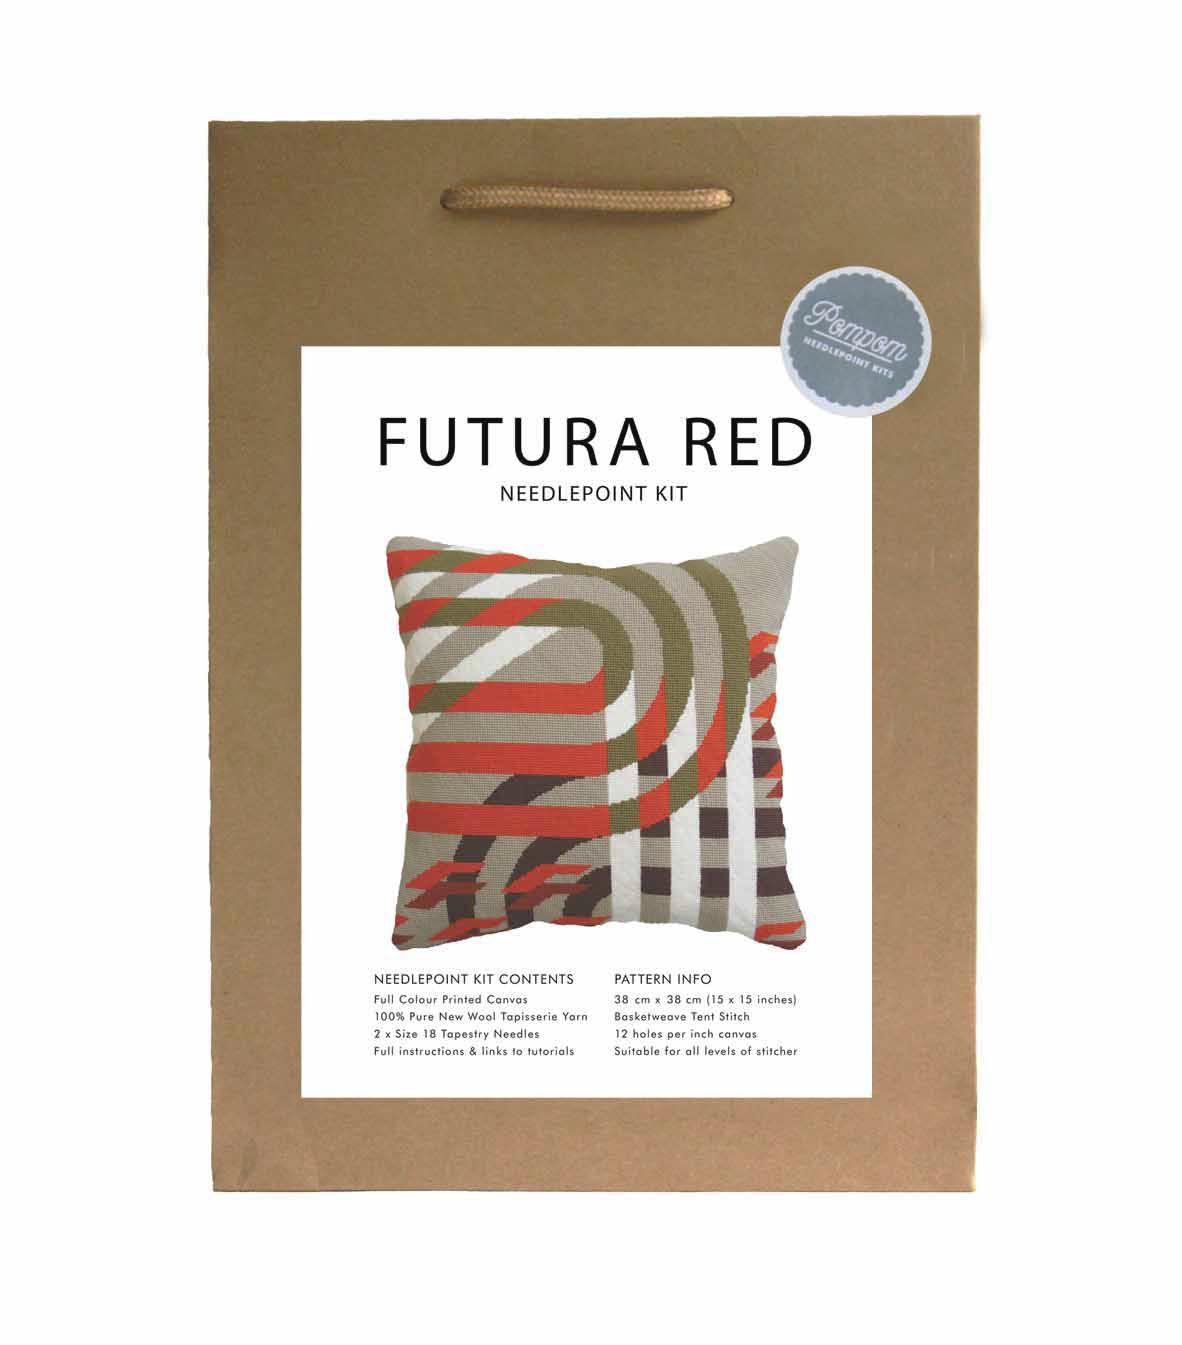 FUTURA RED NEEDLEPOINT KIT